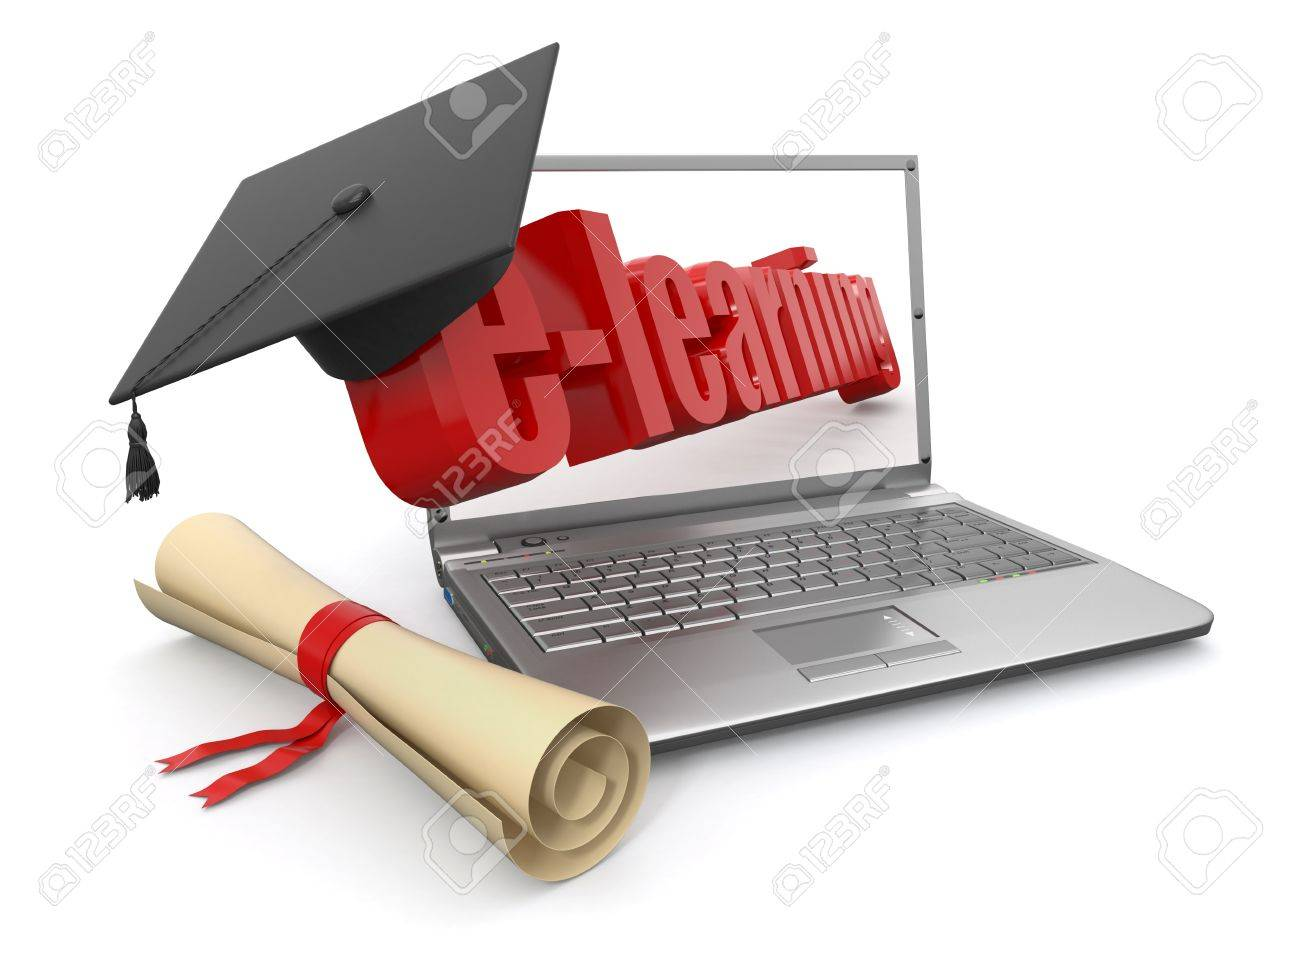 E Learning Laptop Diplom Und Mörtel Bord 3d Lizenzfreie Fotos